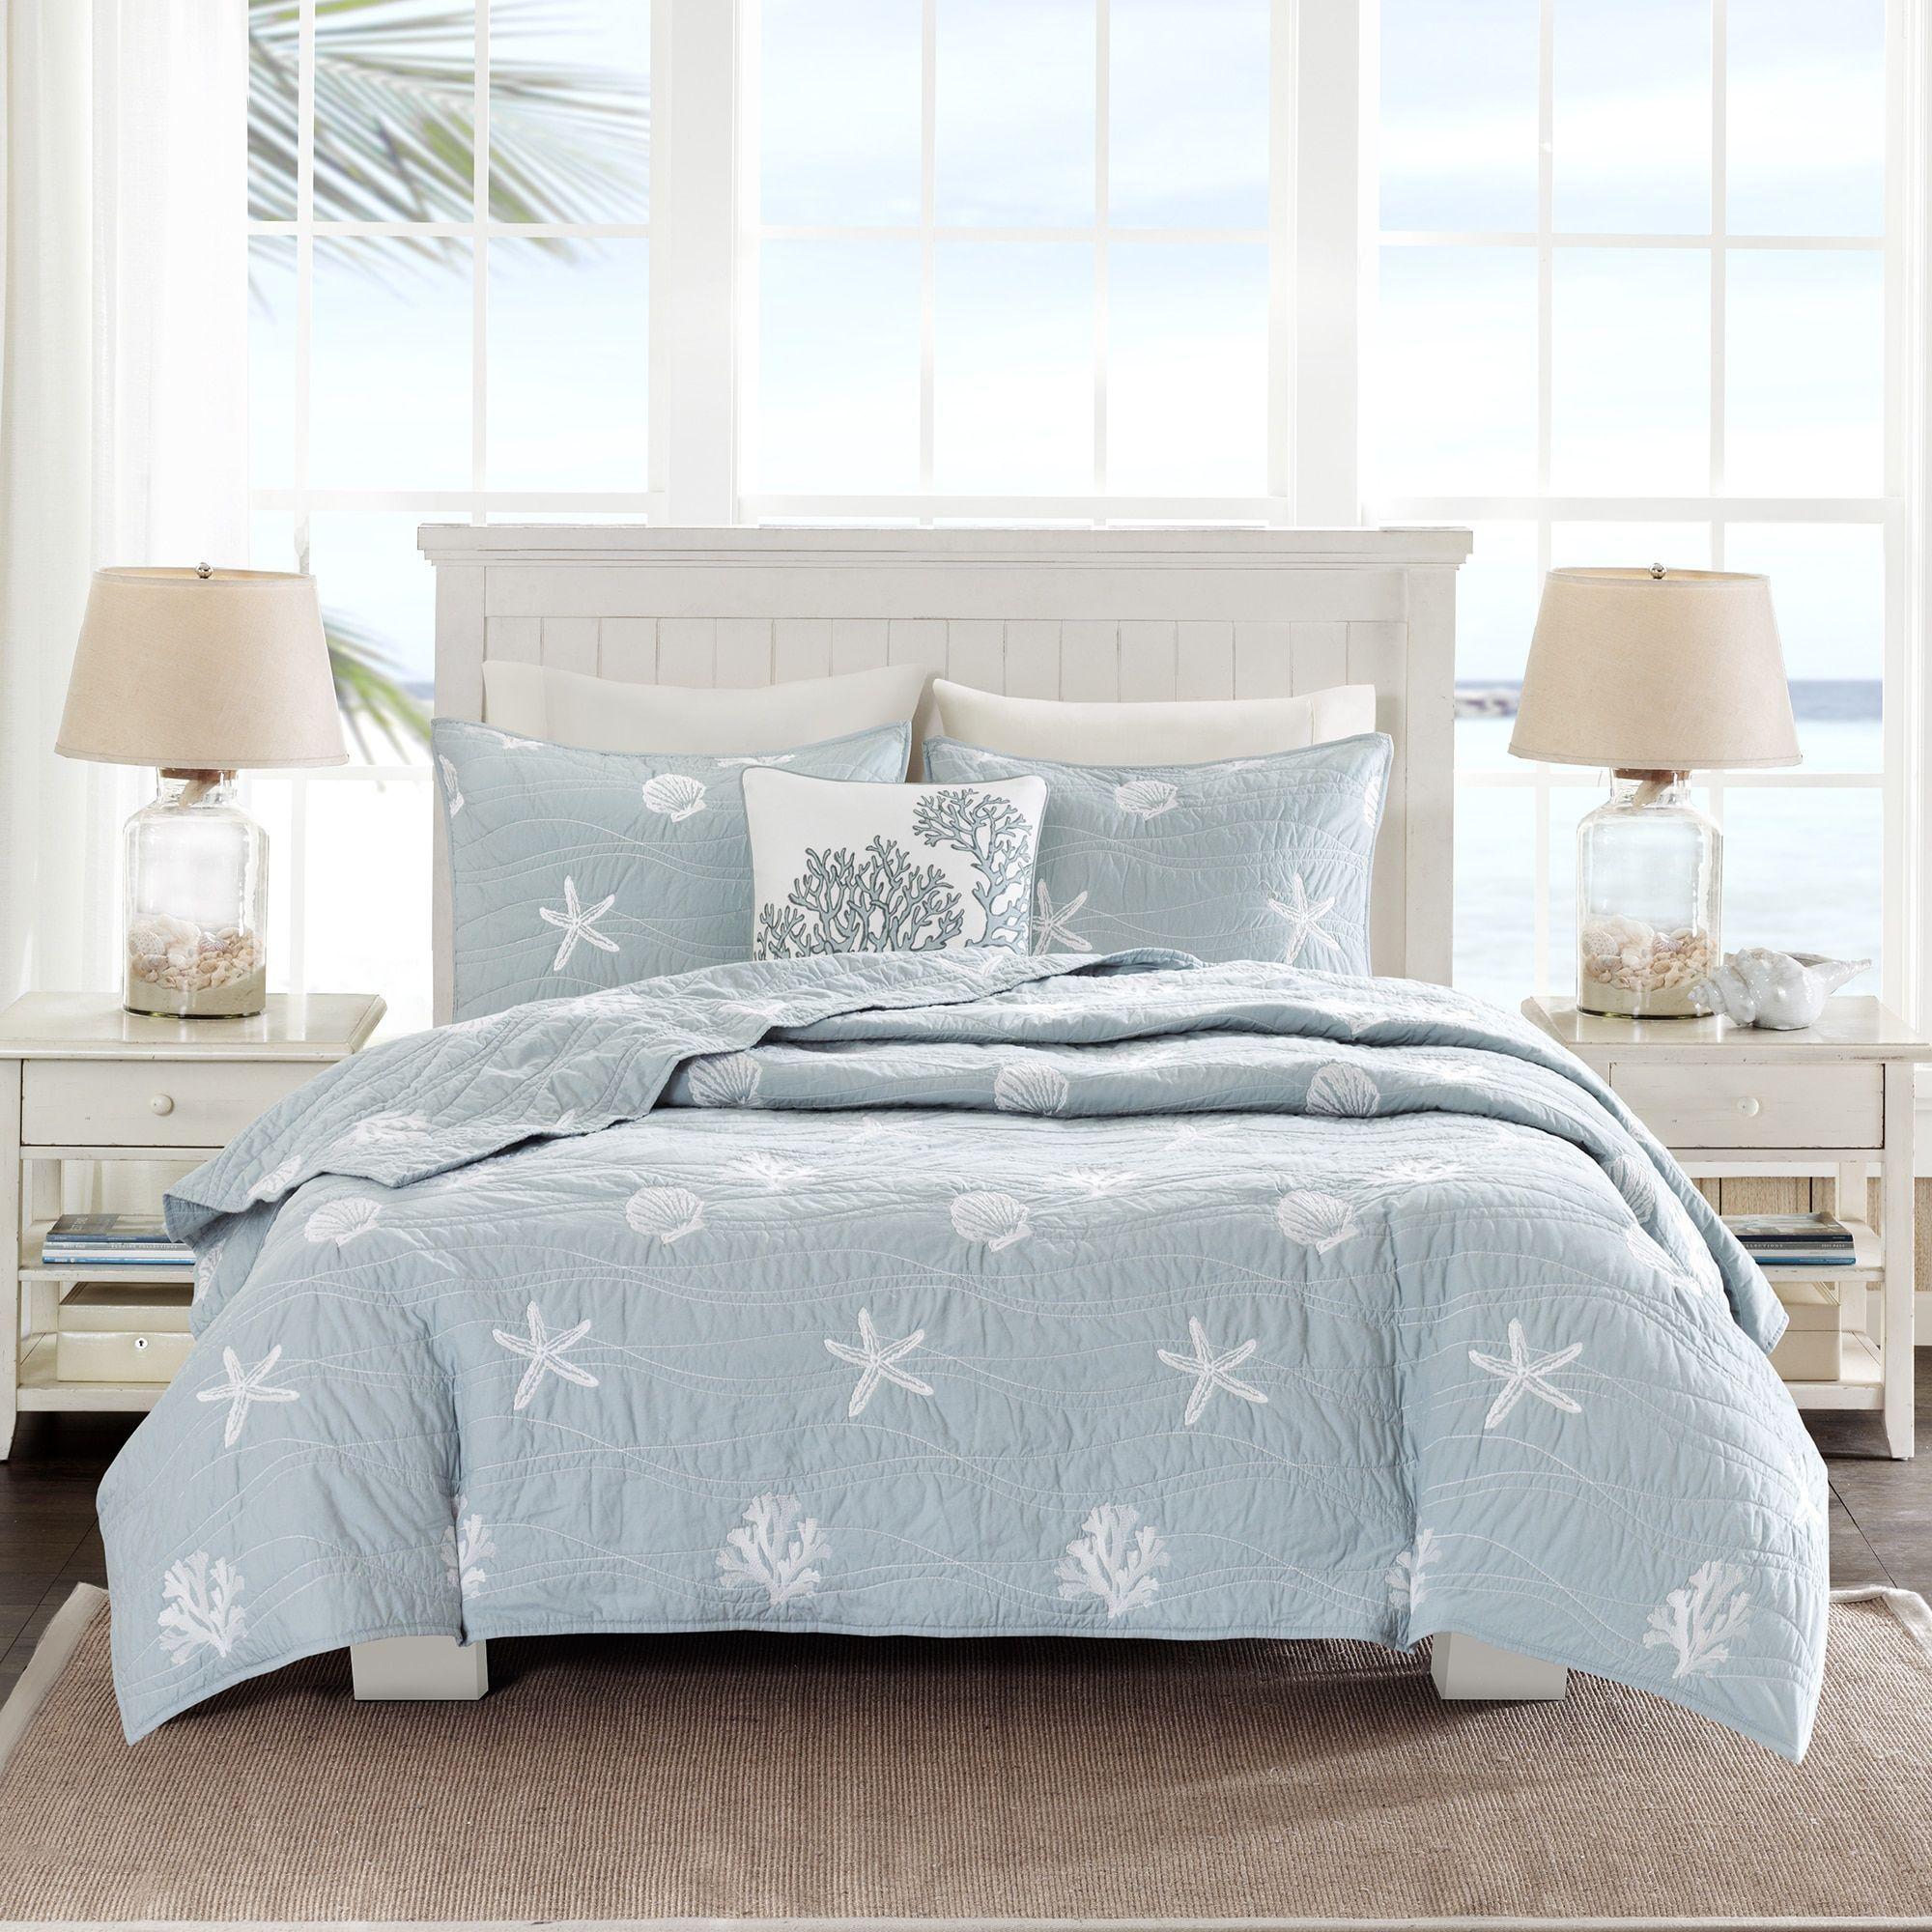 Beach Shell Starfish Grey Brown Blue Quilt Coverlet Cal King Queen 3 pcs set